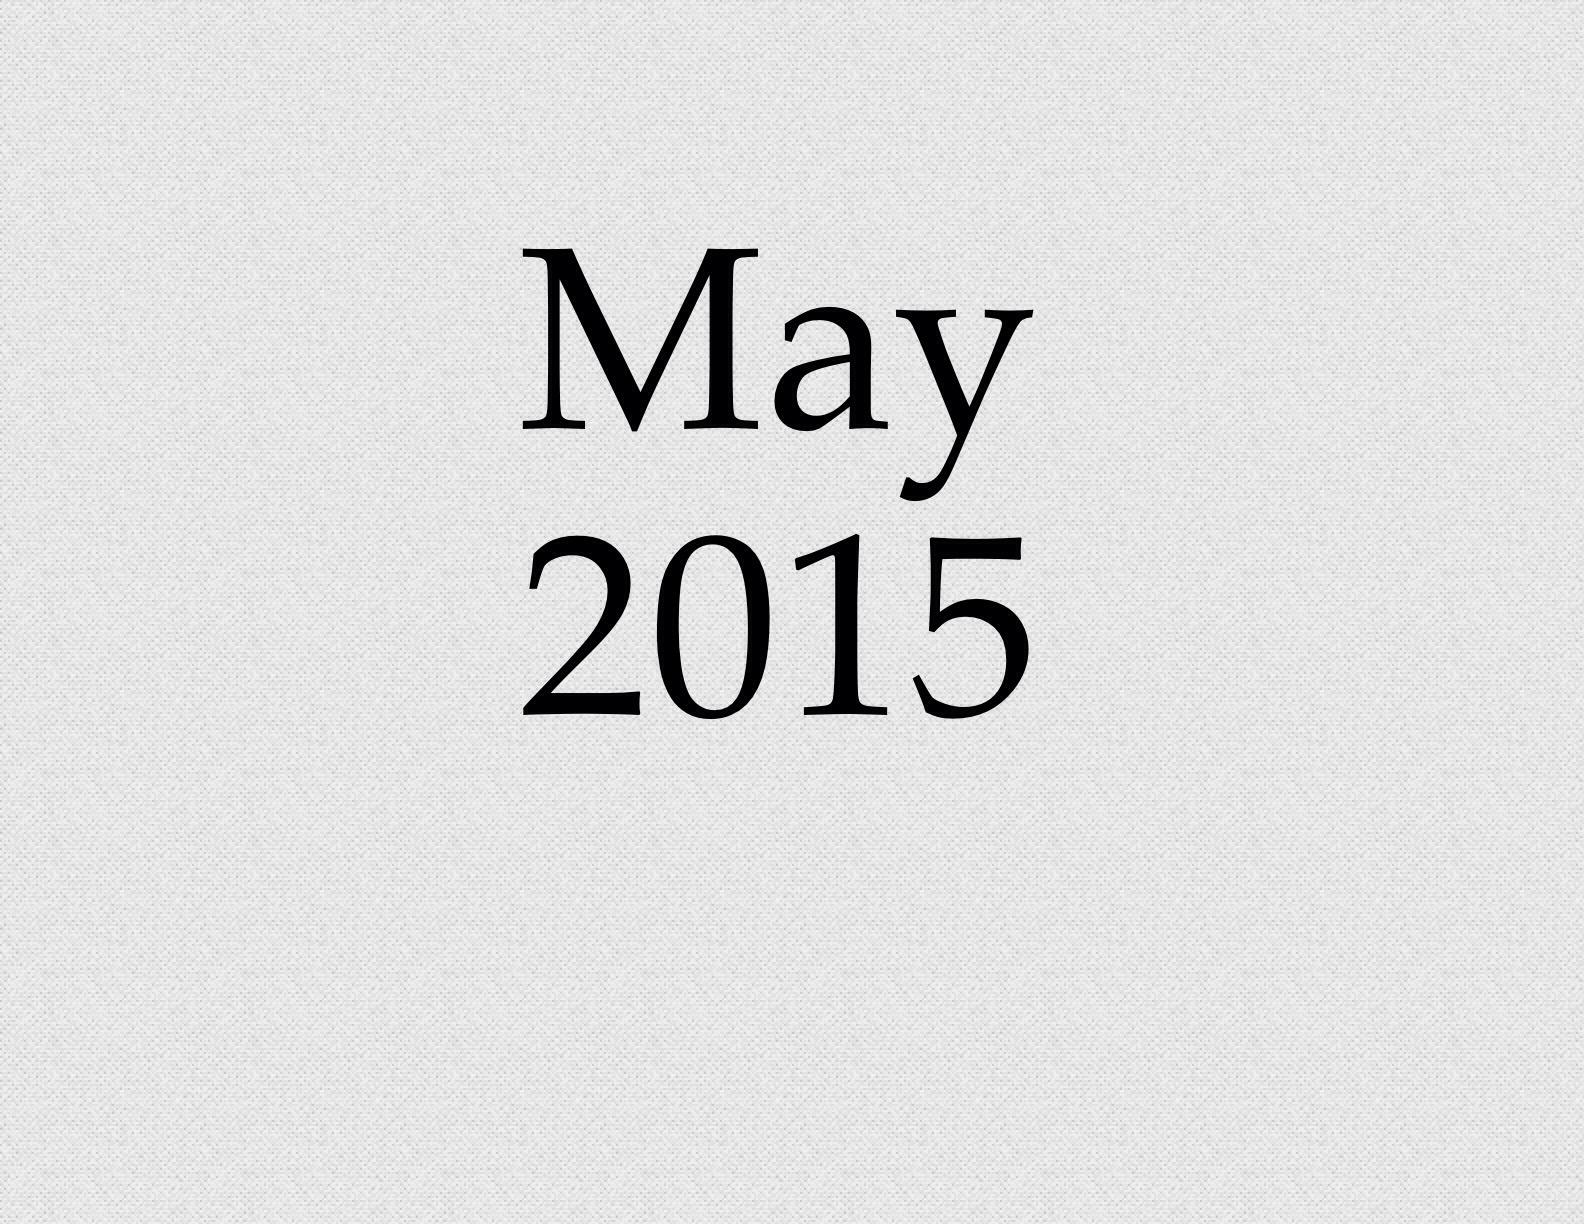 Photo May 05, 6 25 09 PM.jpg